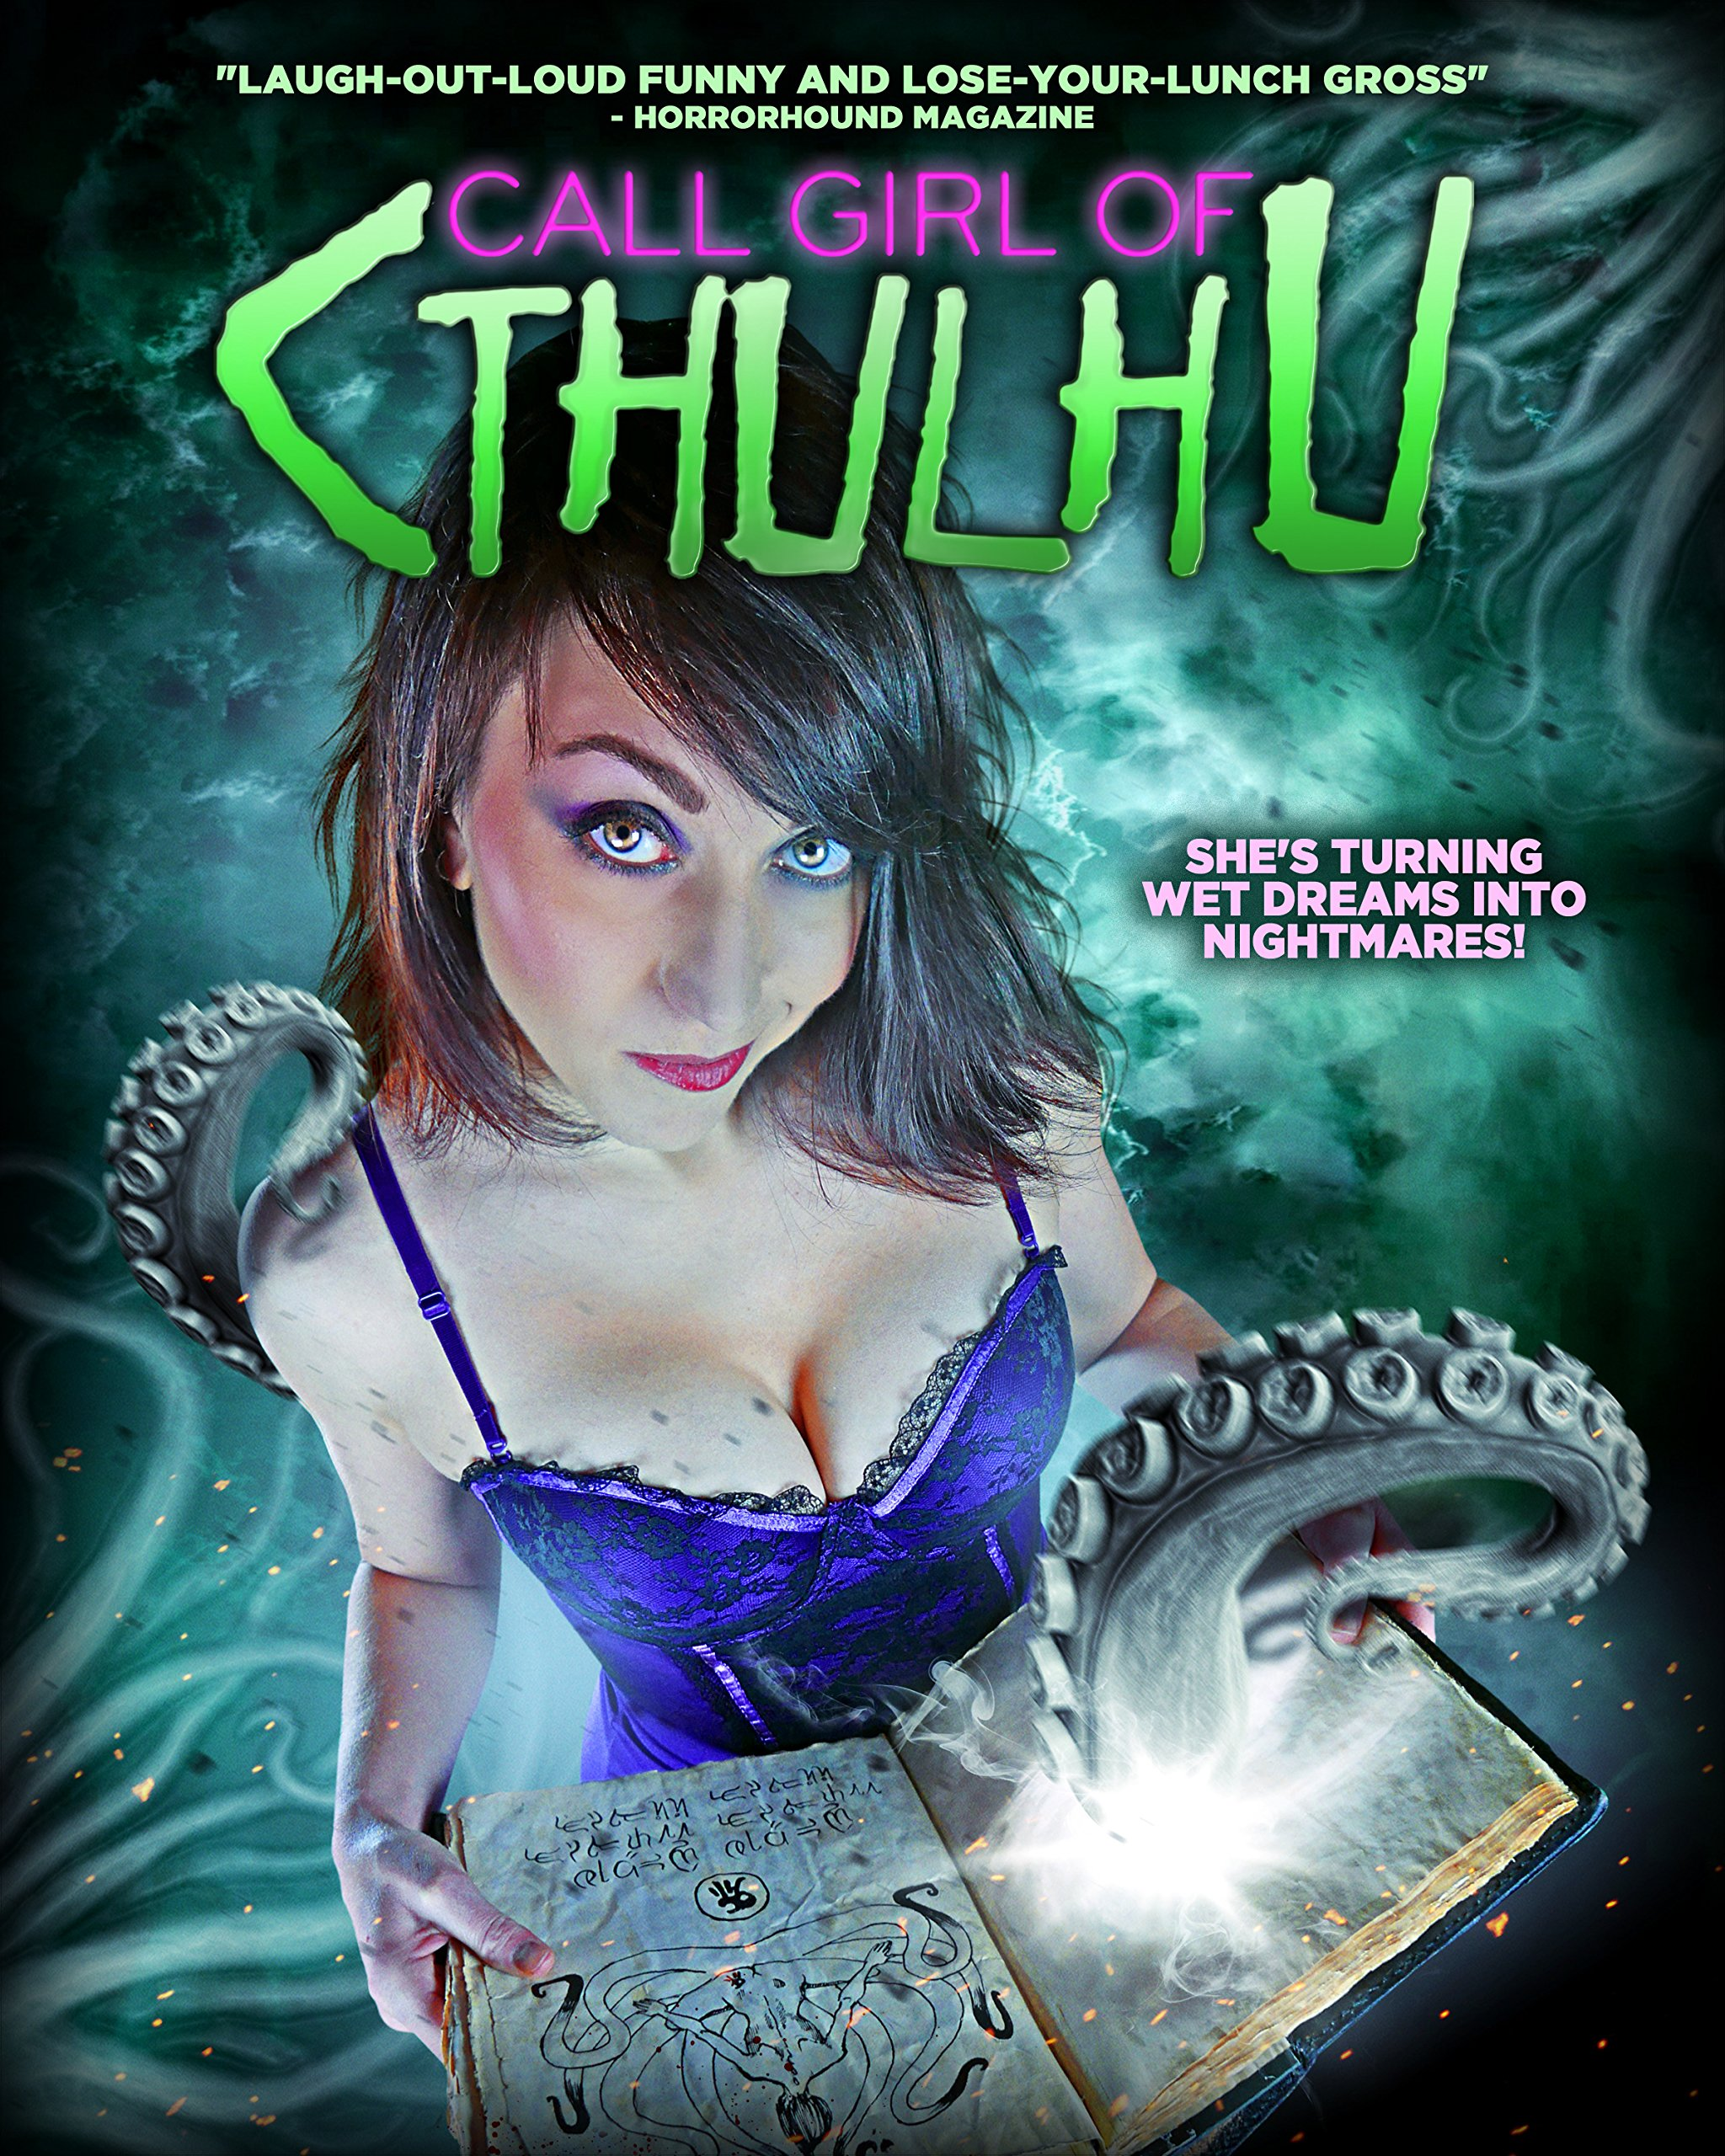 Amazon.com: Call Girl of Cthulhu: David Phillip Carollo, George ...